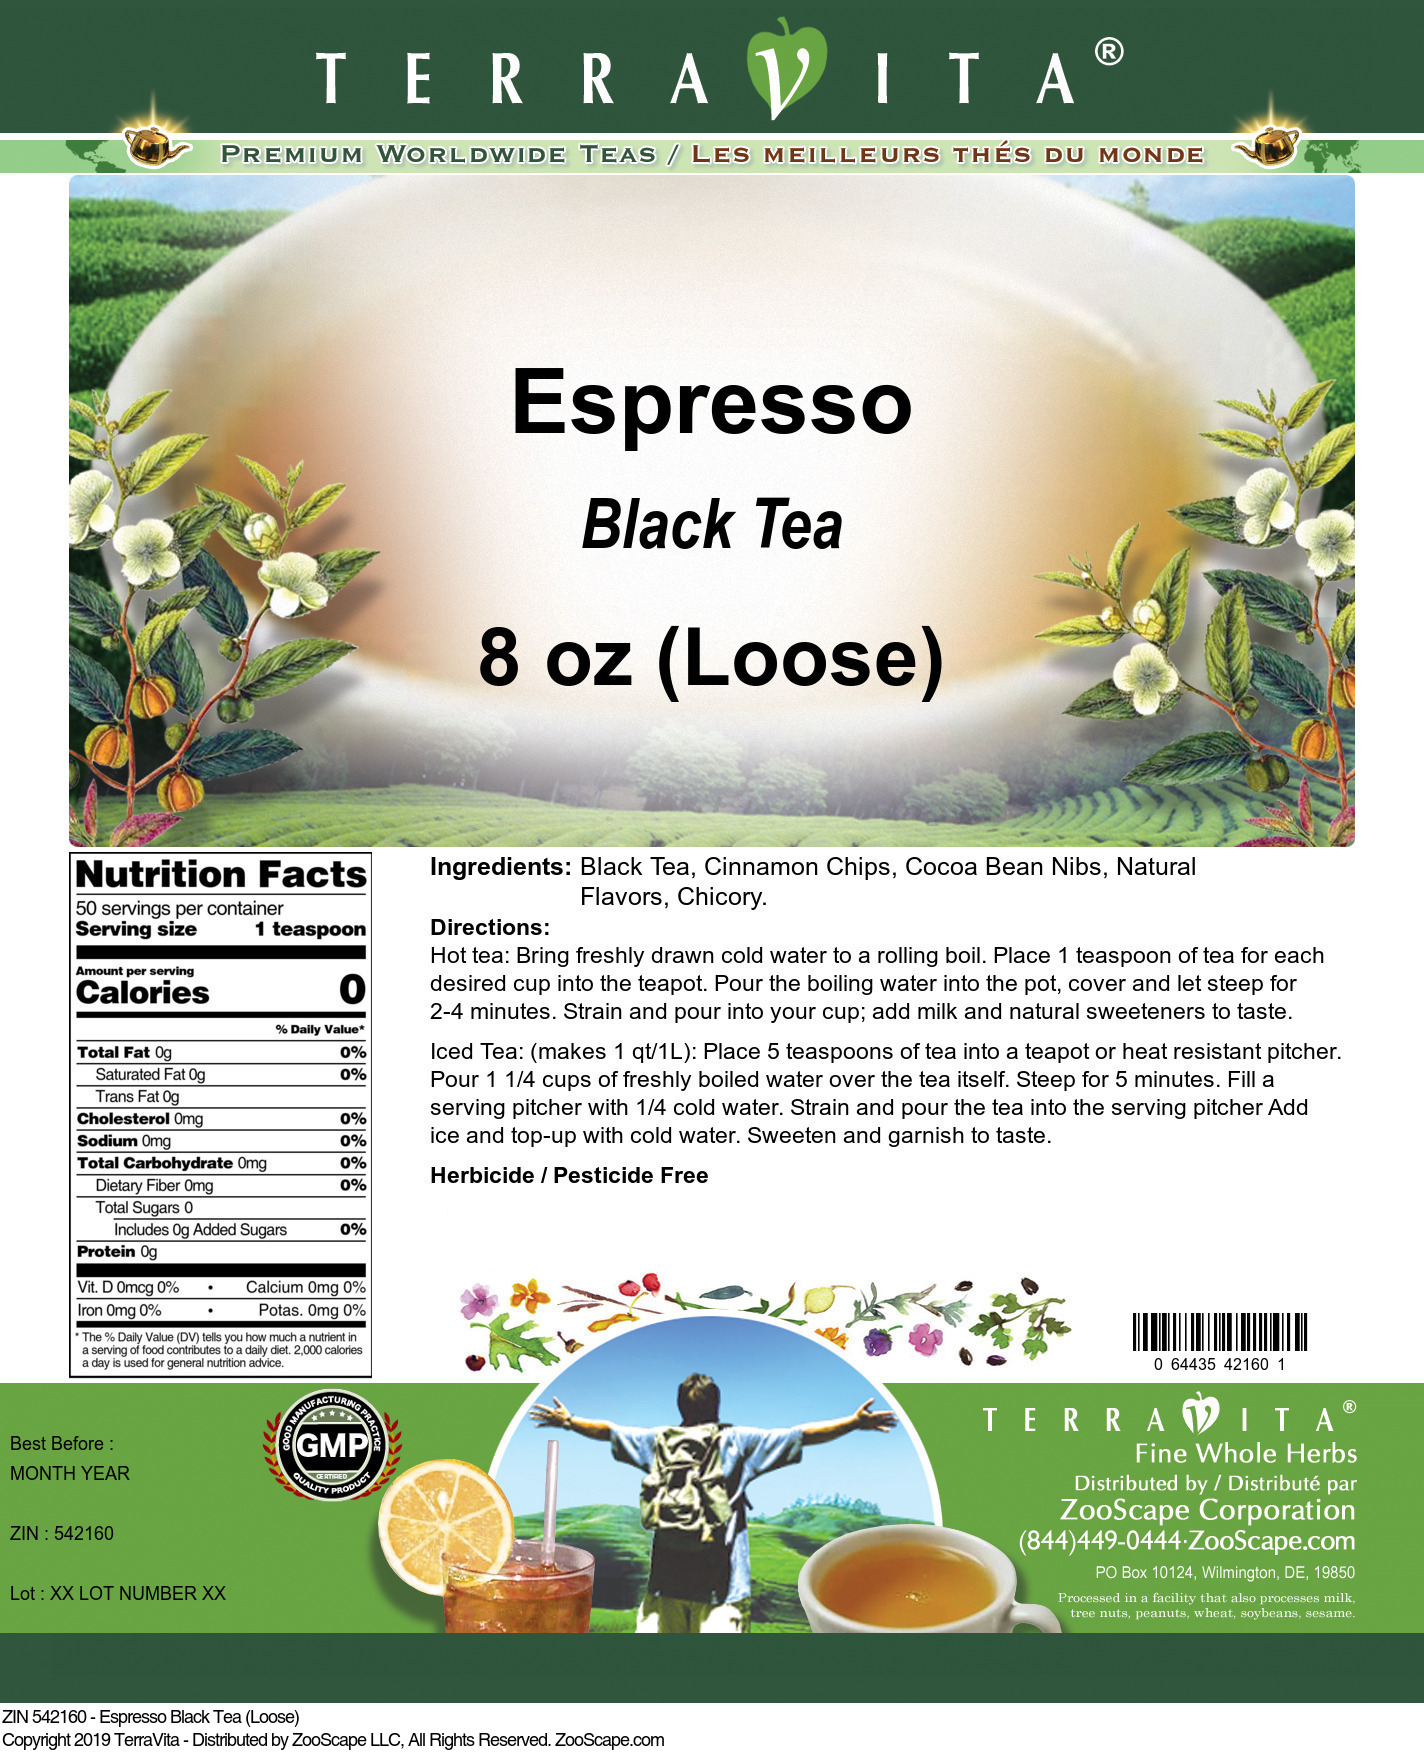 Espresso Black Tea